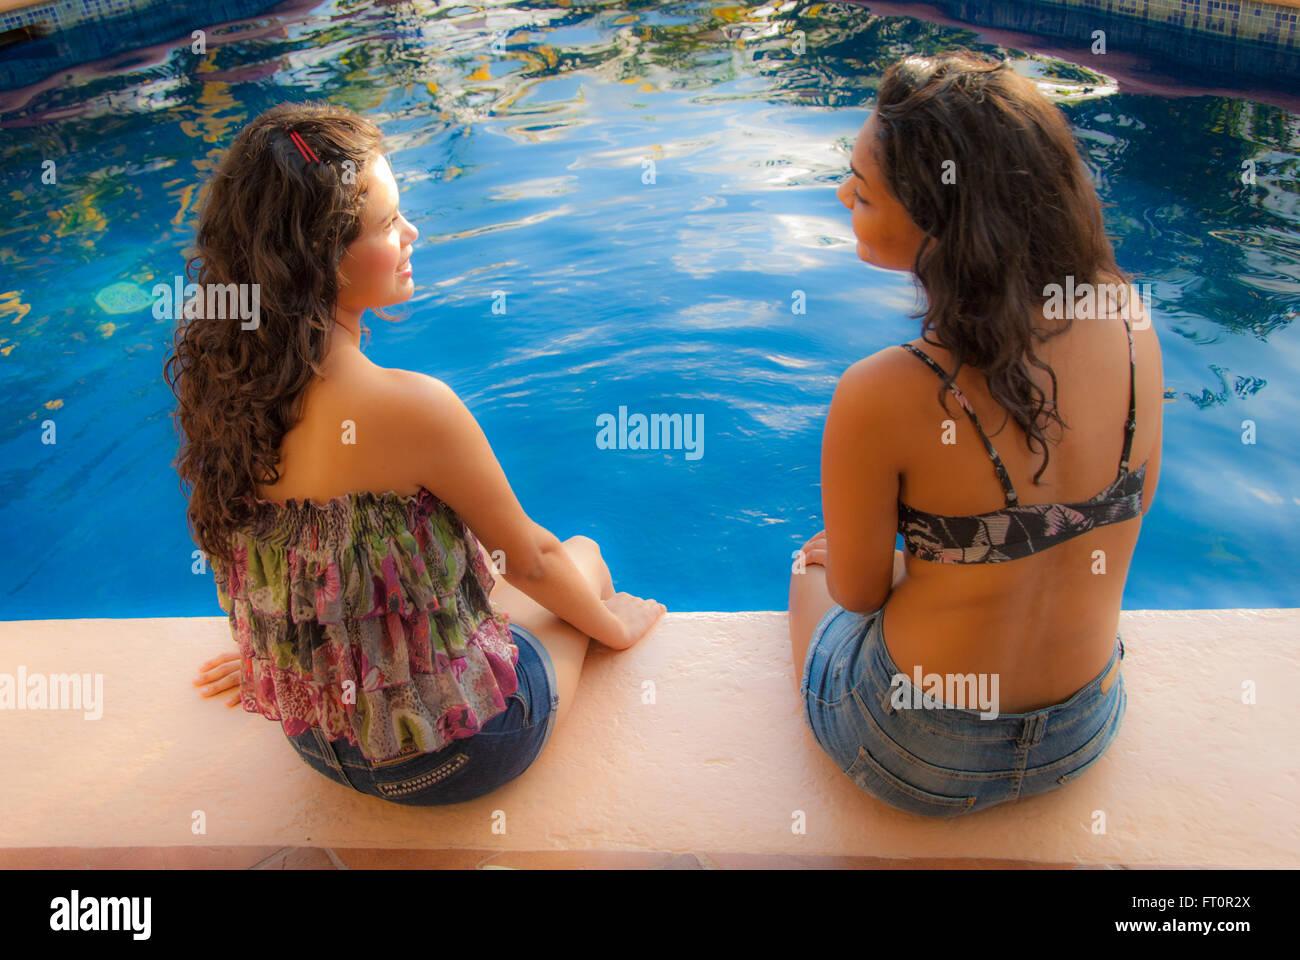 2 young Hispanic women sit by swimming pool, Puerto Vallarta, Mexico  #613PV - Stock Image